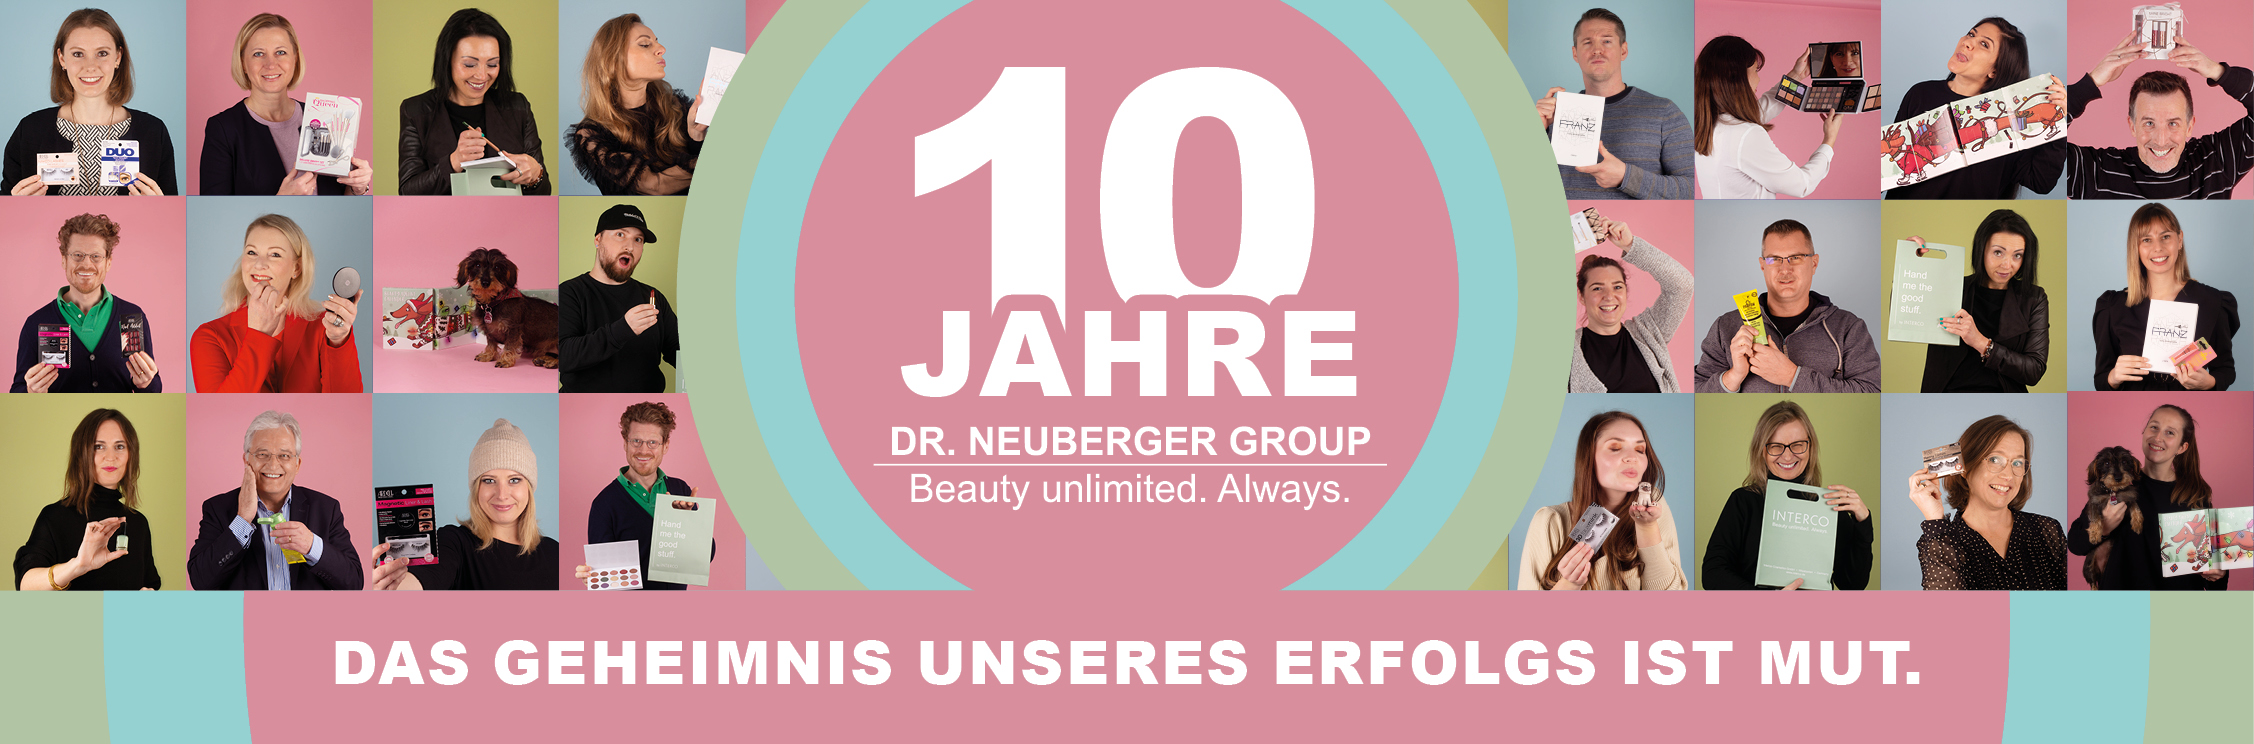 10 Jahre DR. NEUBERGER GROUP